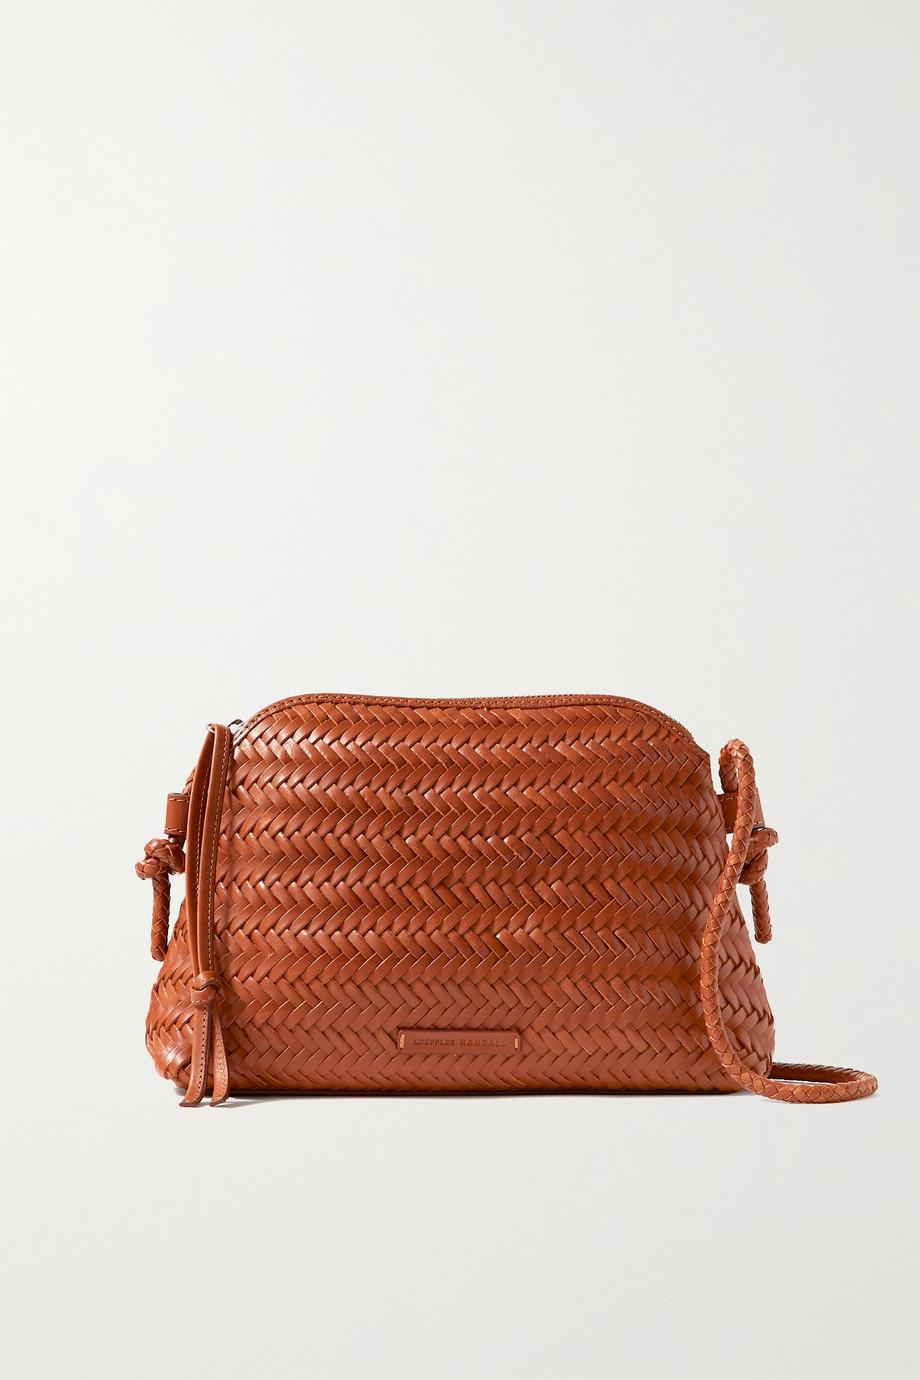 Loeffler Randall Mallory woven leather shoulder bag